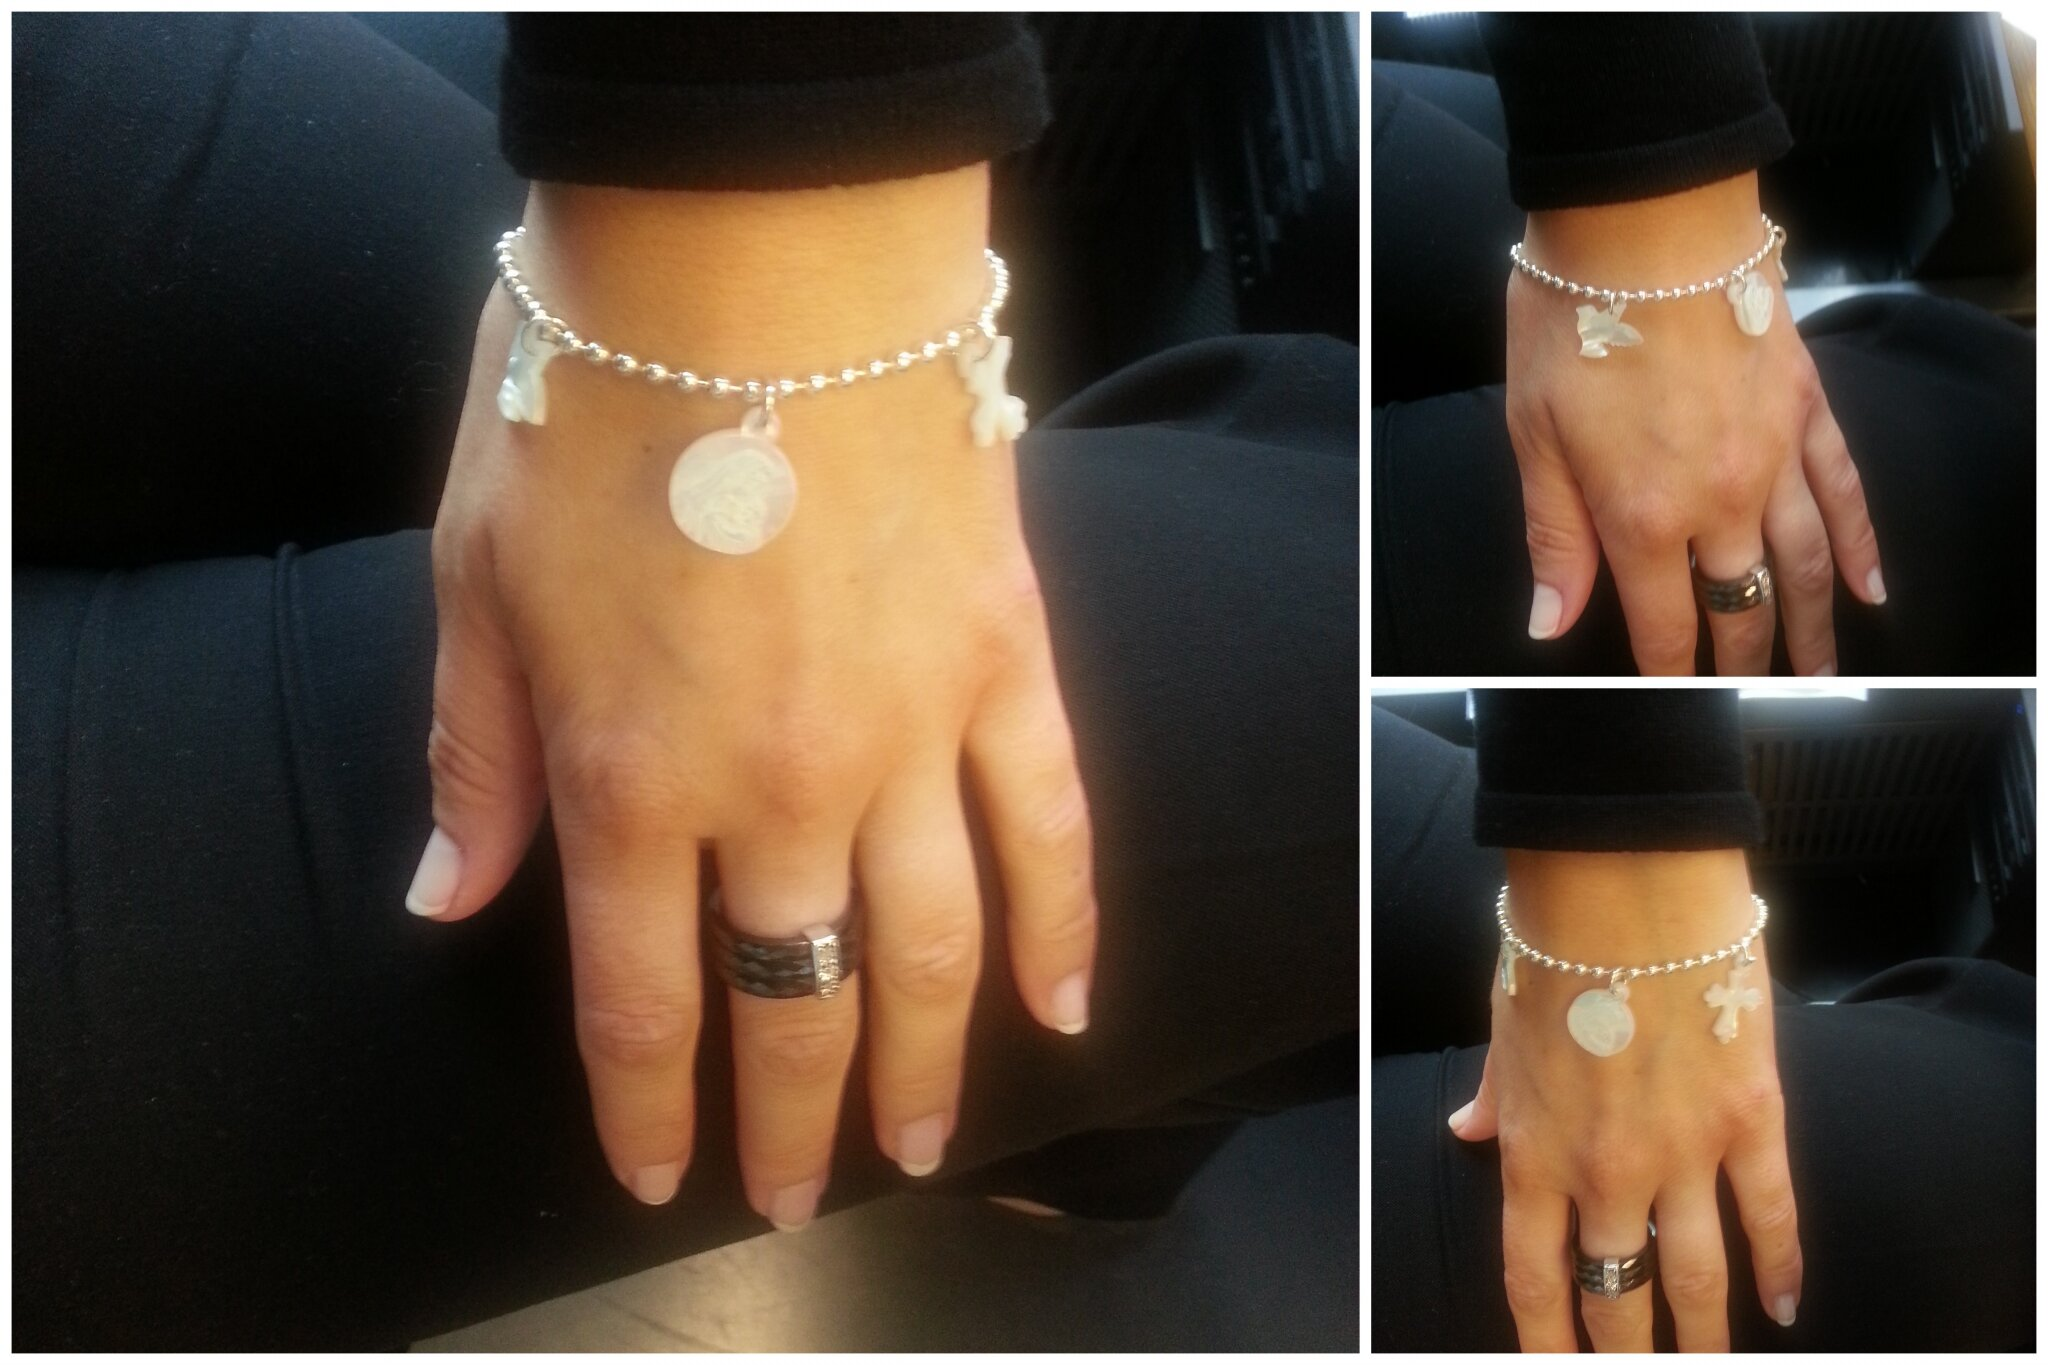 Le bracelet de Tania